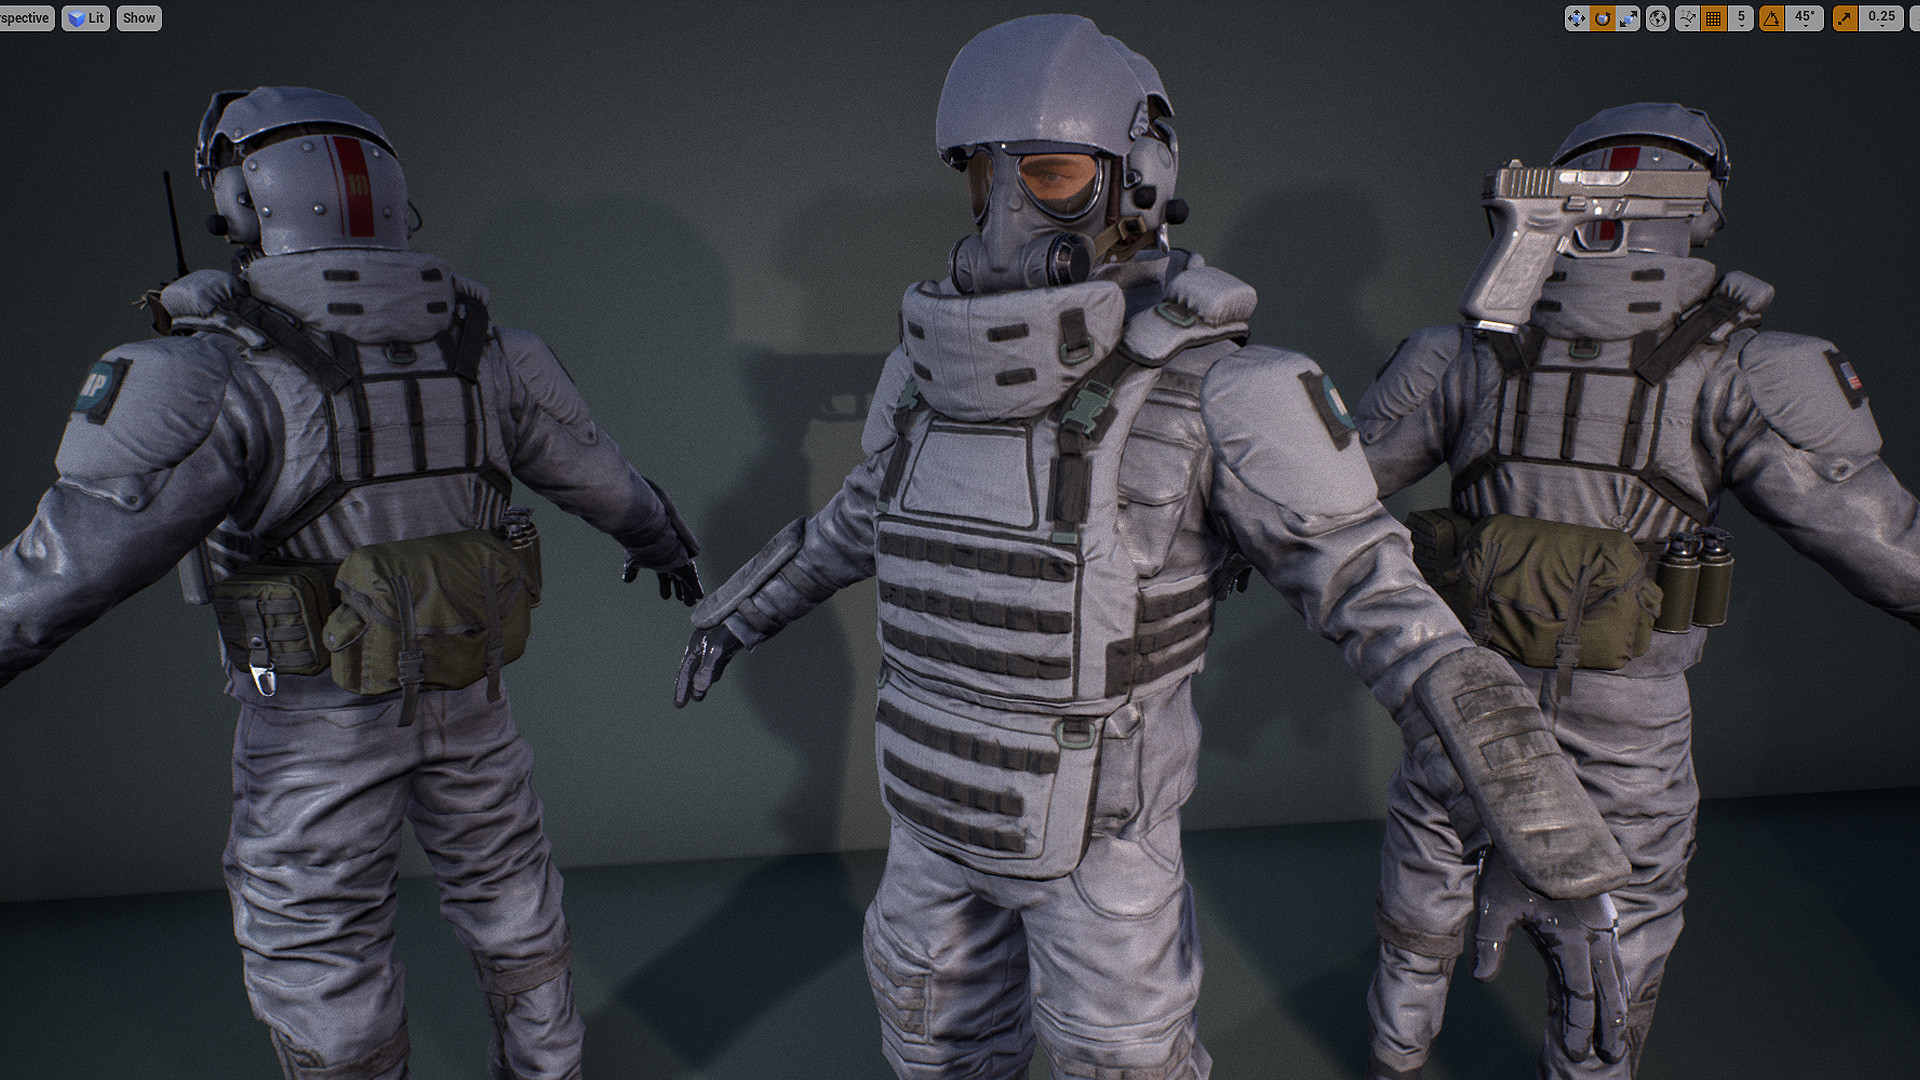 ArtStation - Heavy G soldier and Free Pistol Asset, Alex Ponomarev